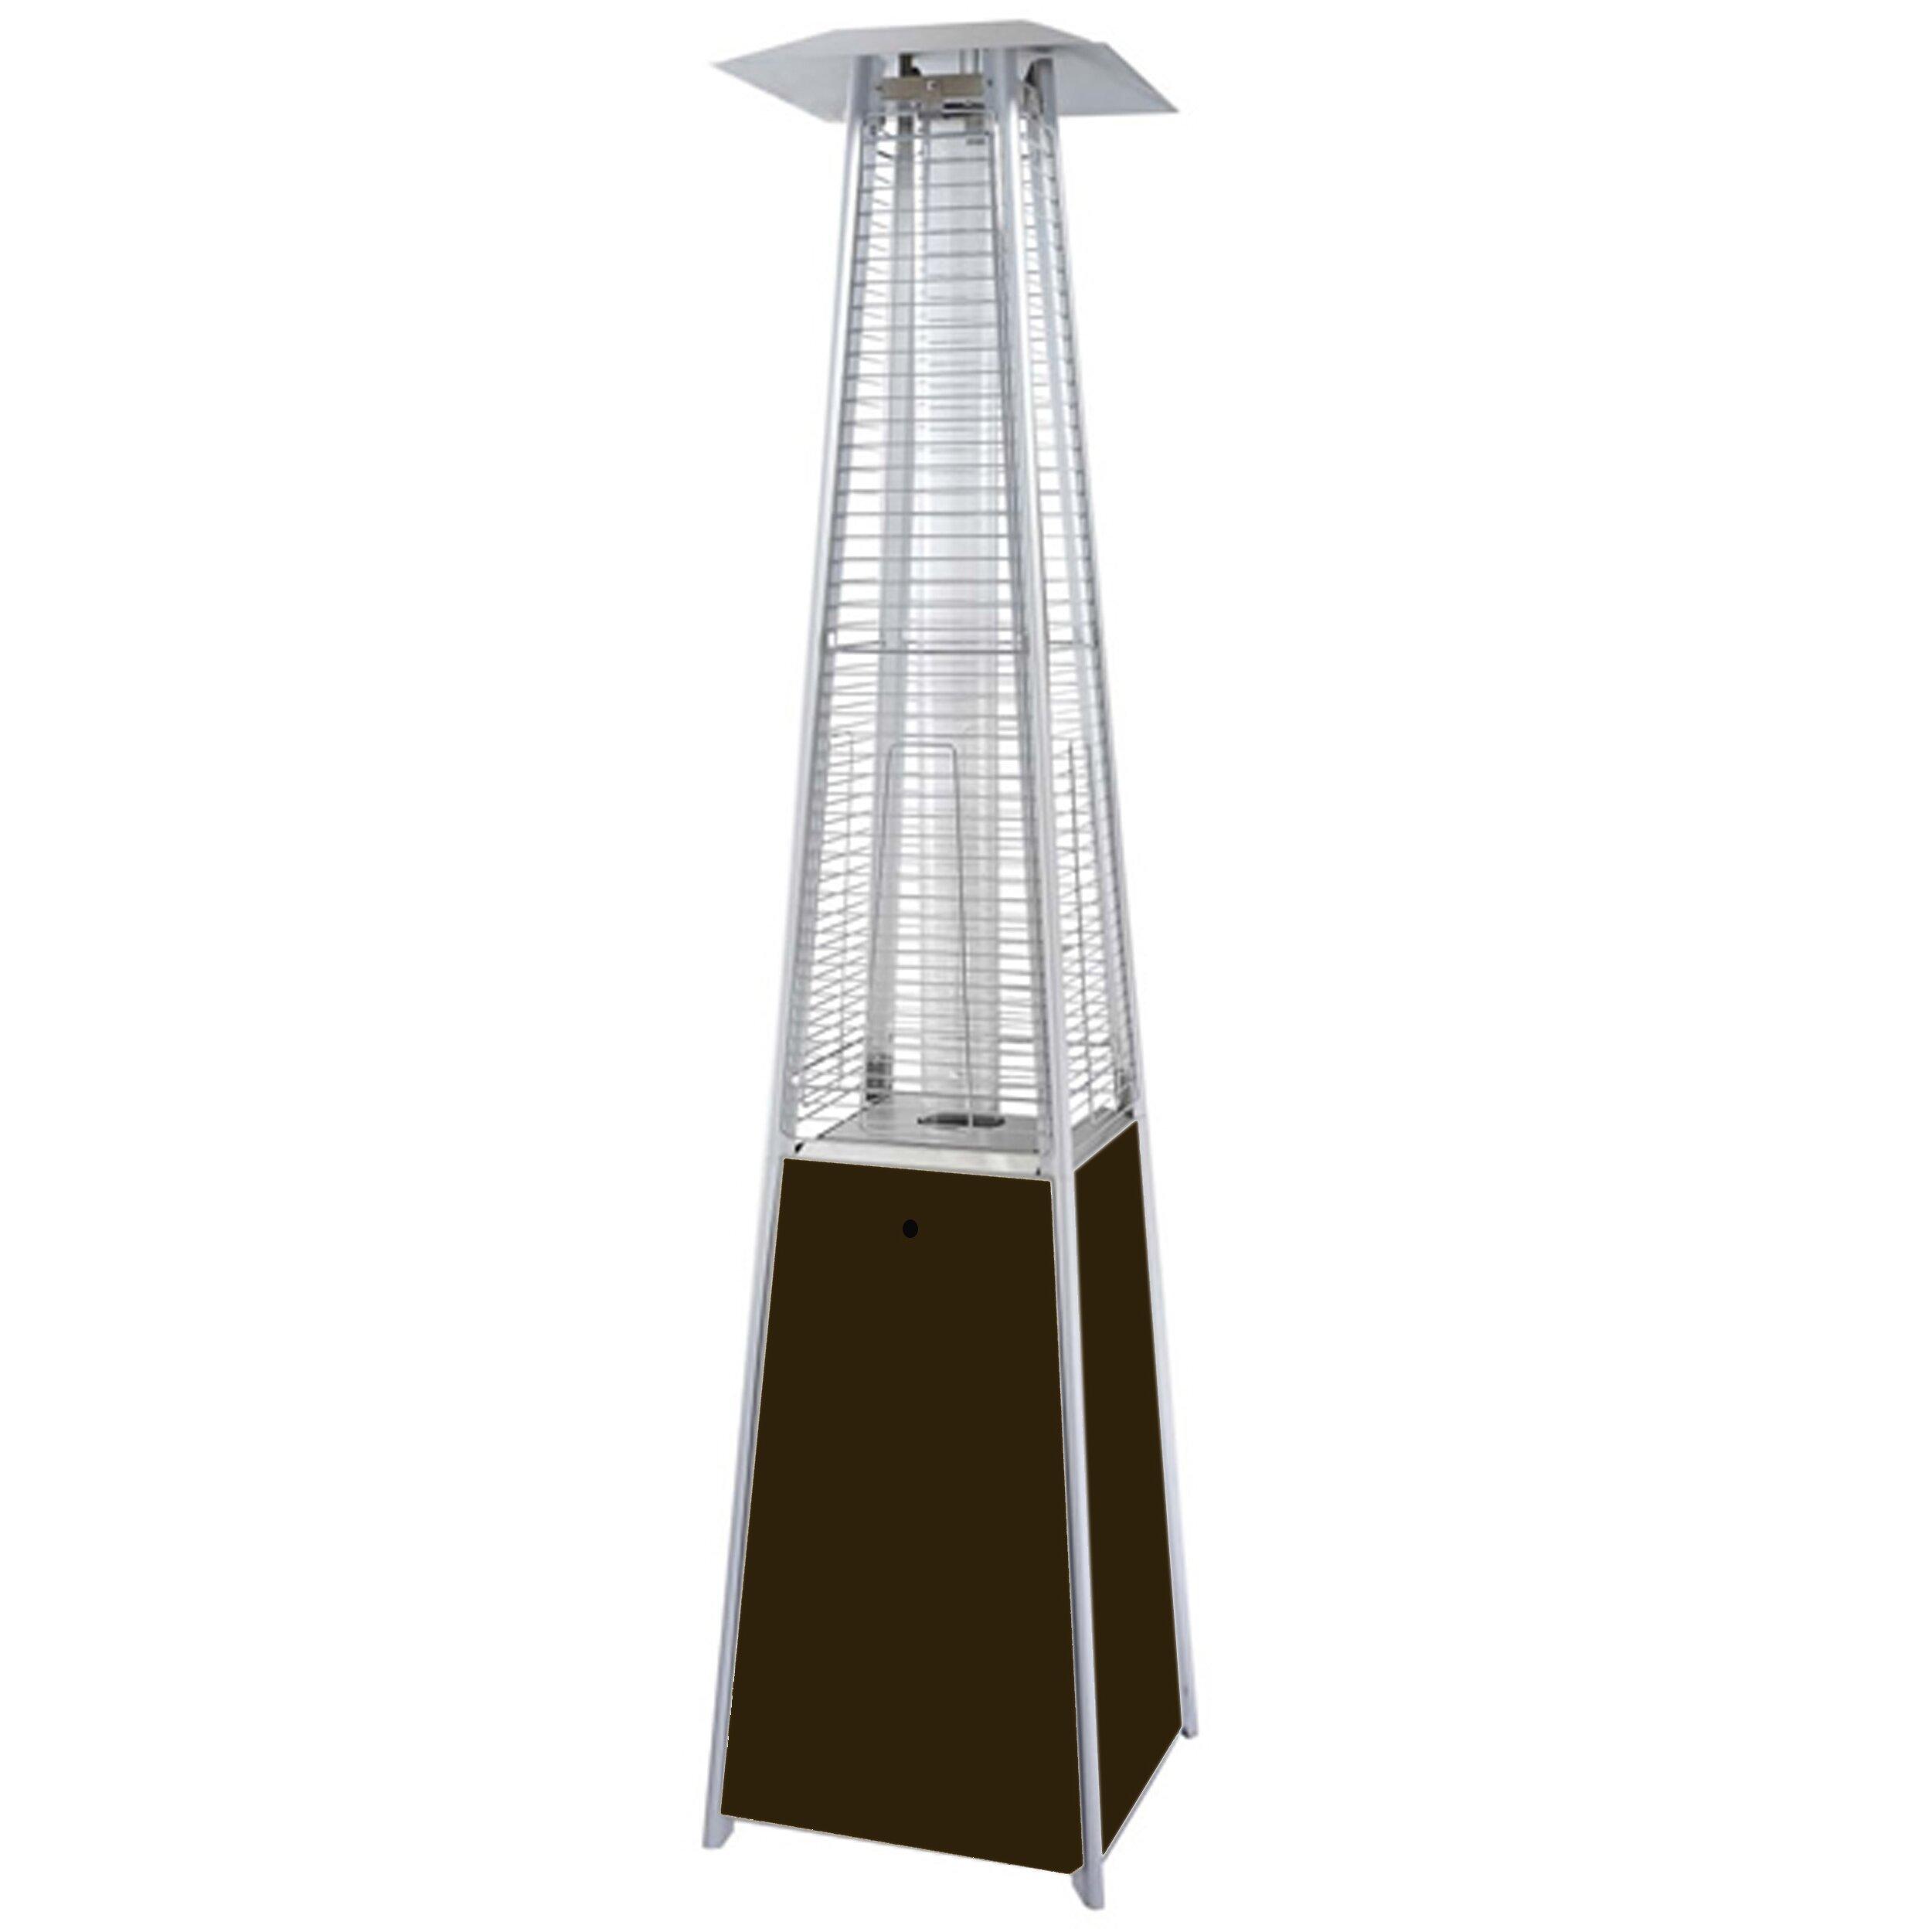 AZ Patio Heaters Tall Propane Patio Heater & Reviews